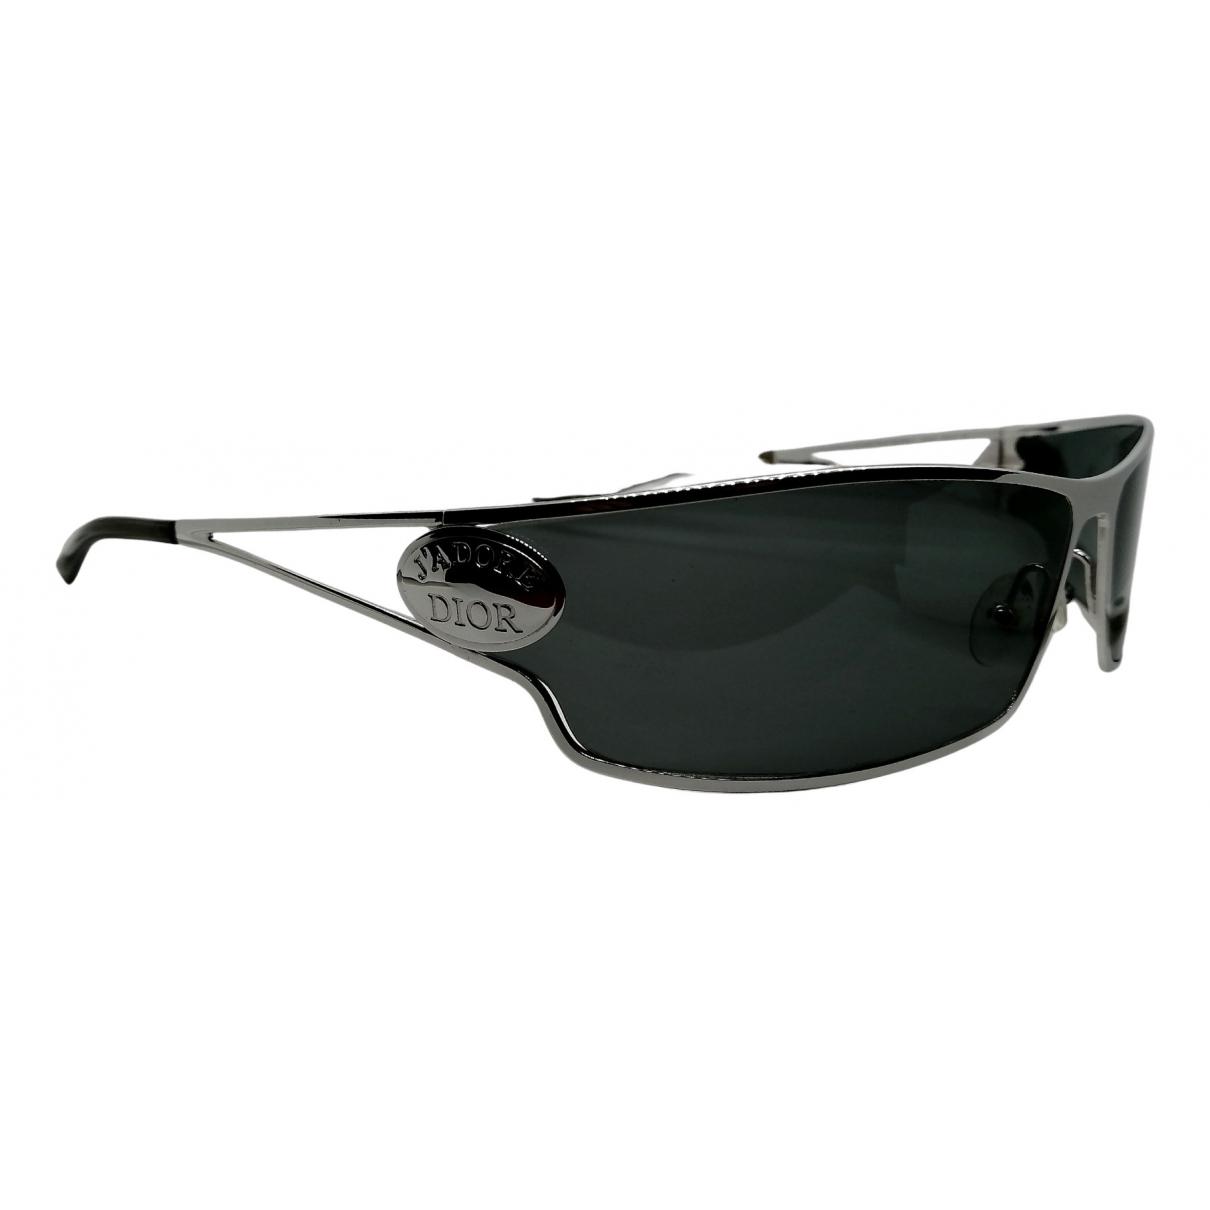 Dior N Silver Metal Sunglasses for Women N